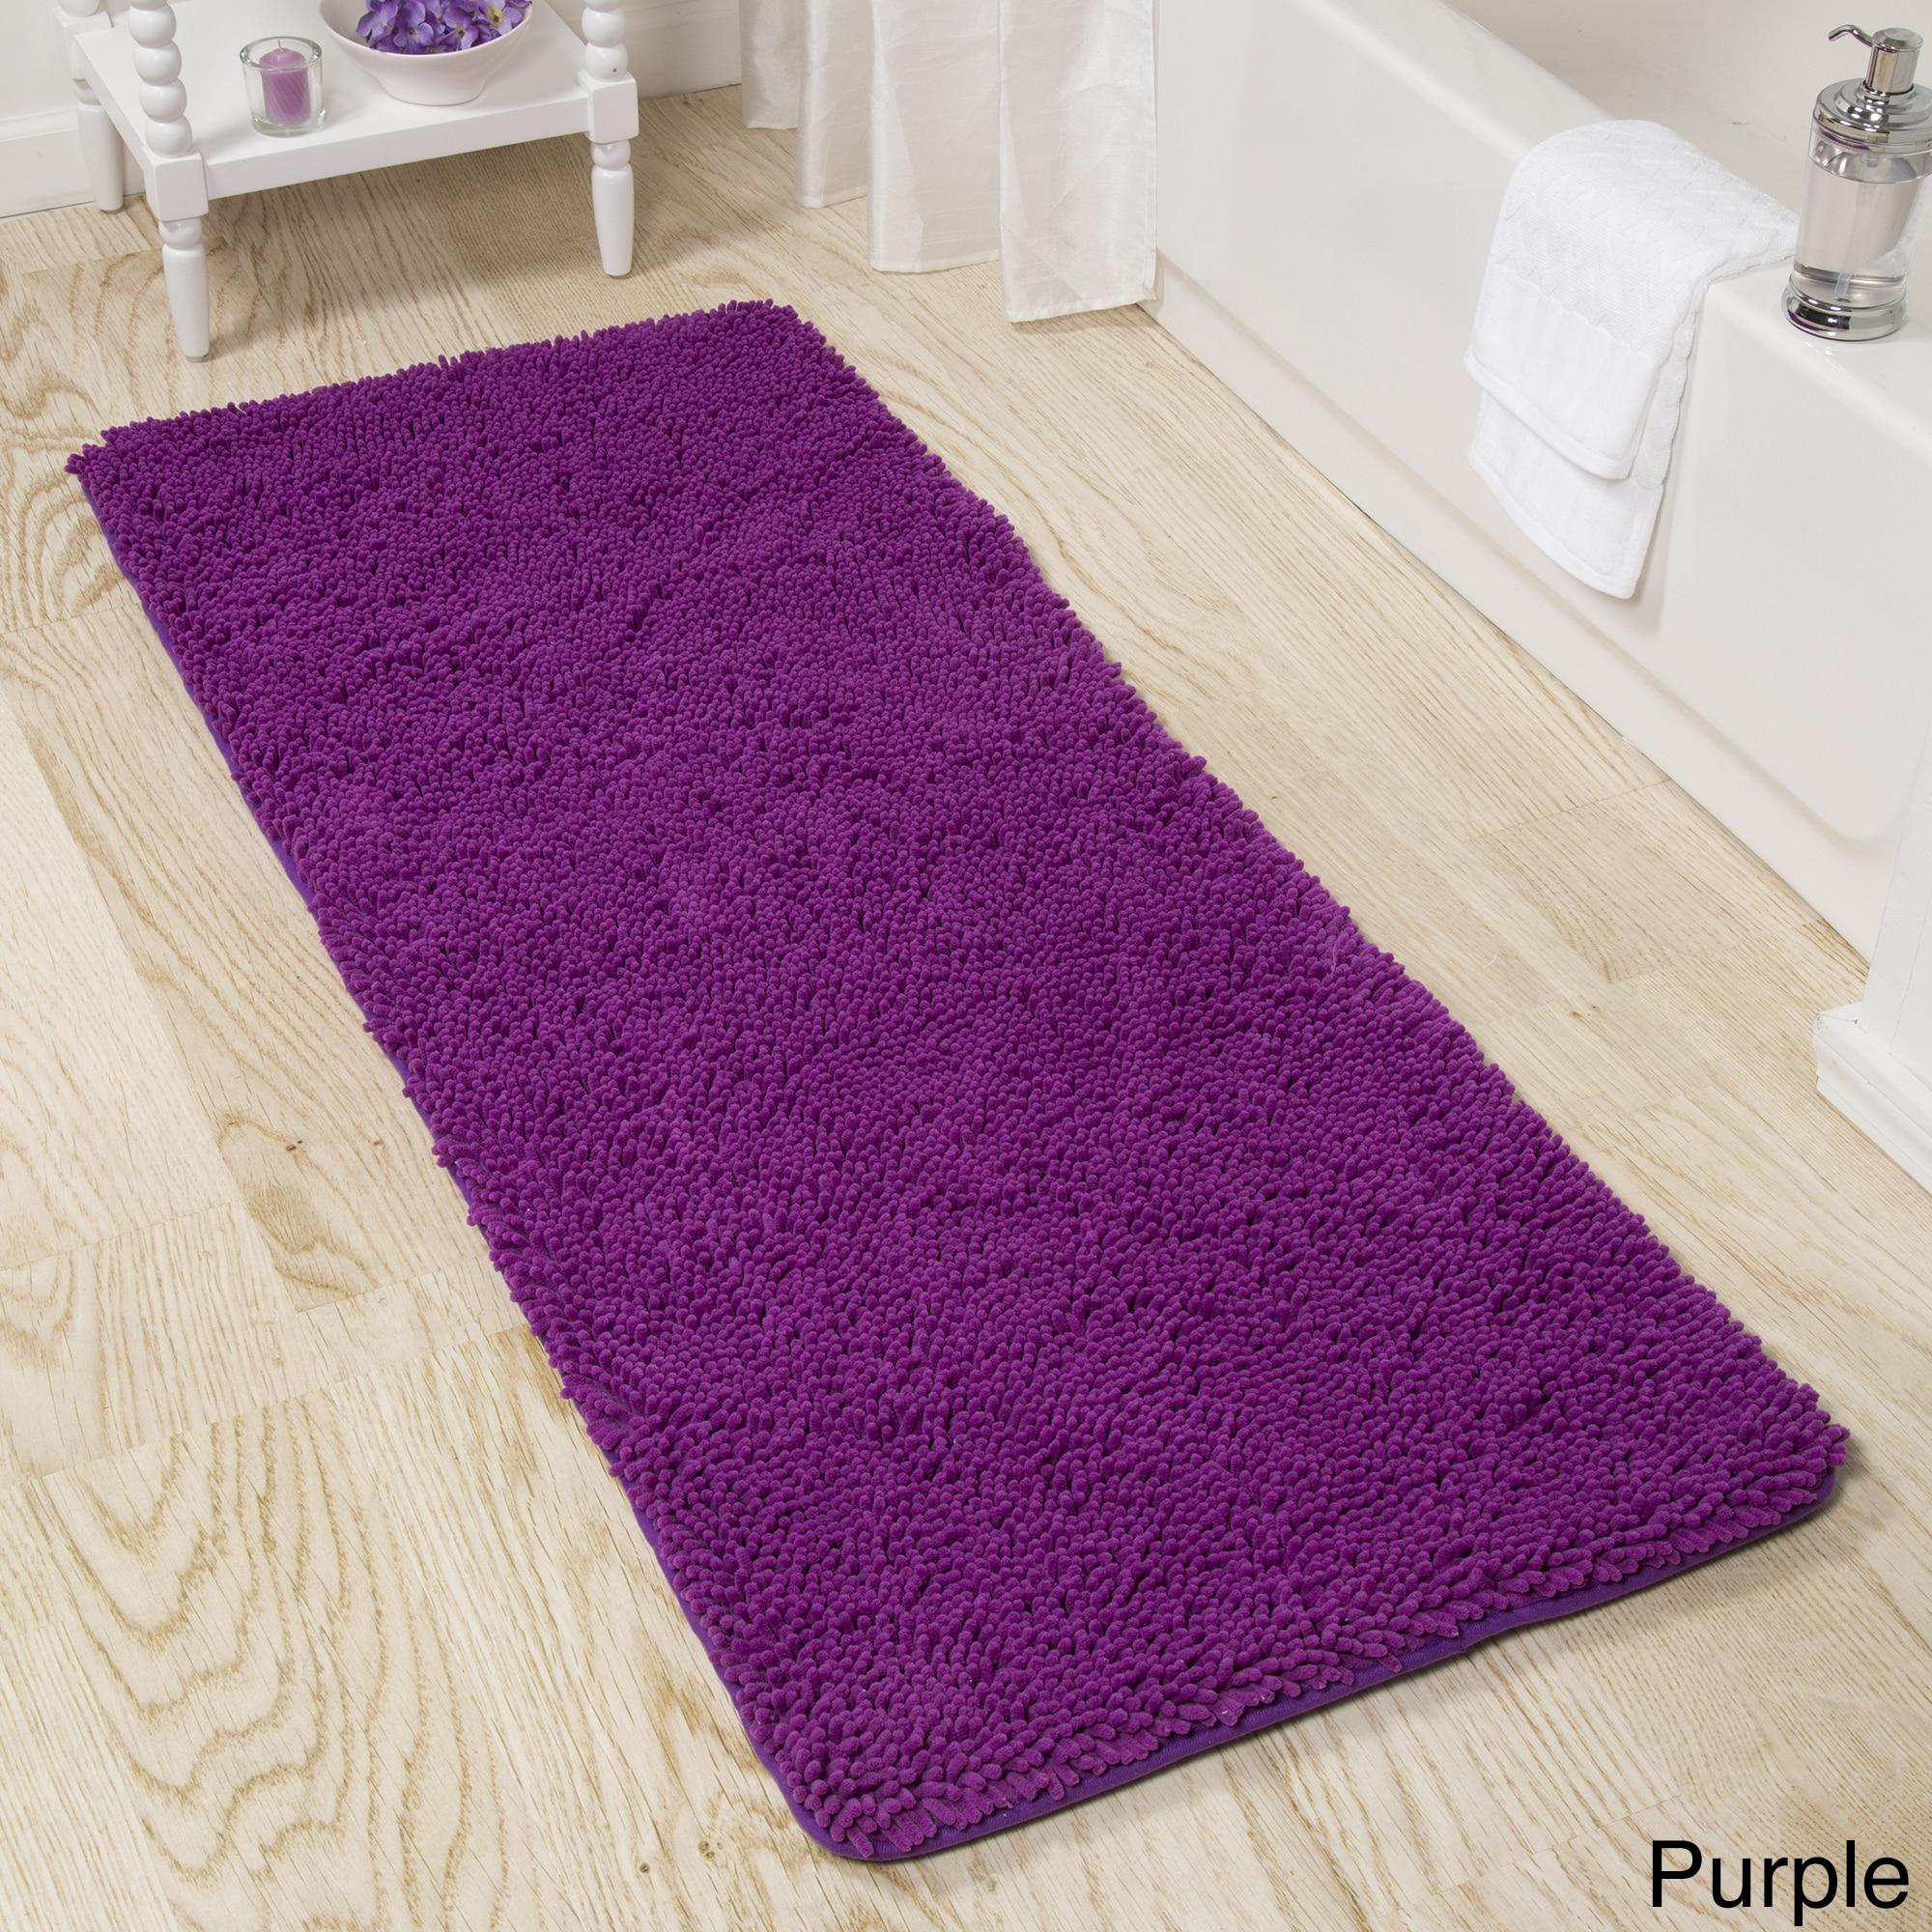 loomage bath purple mat mats